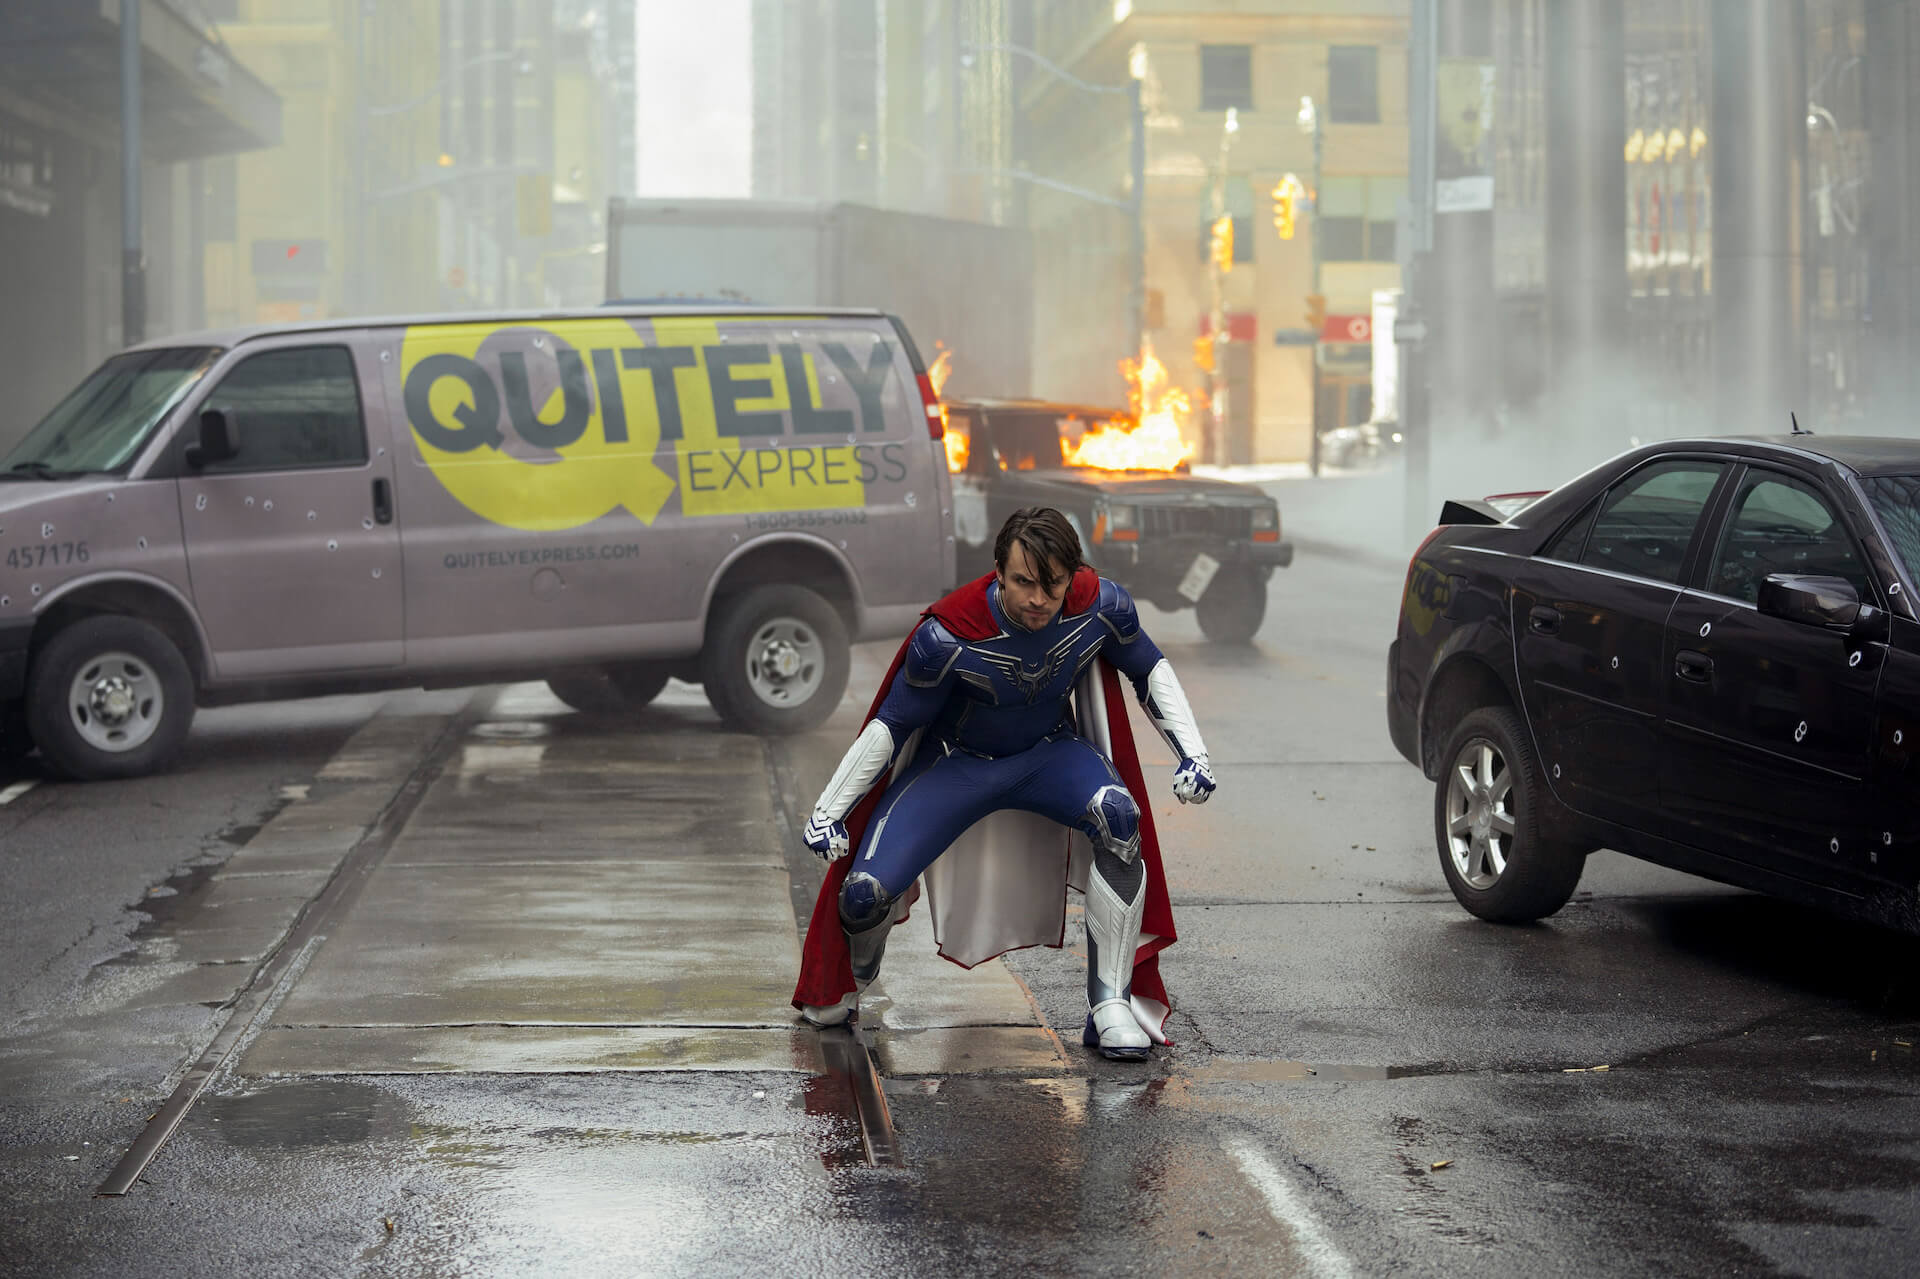 NetflixにMCU『スパイダーマン』が登場!『ファースト・マン』『マスカレード・ホテル』など5月のラインナップが一挙解禁 art210423_netflix_may_15